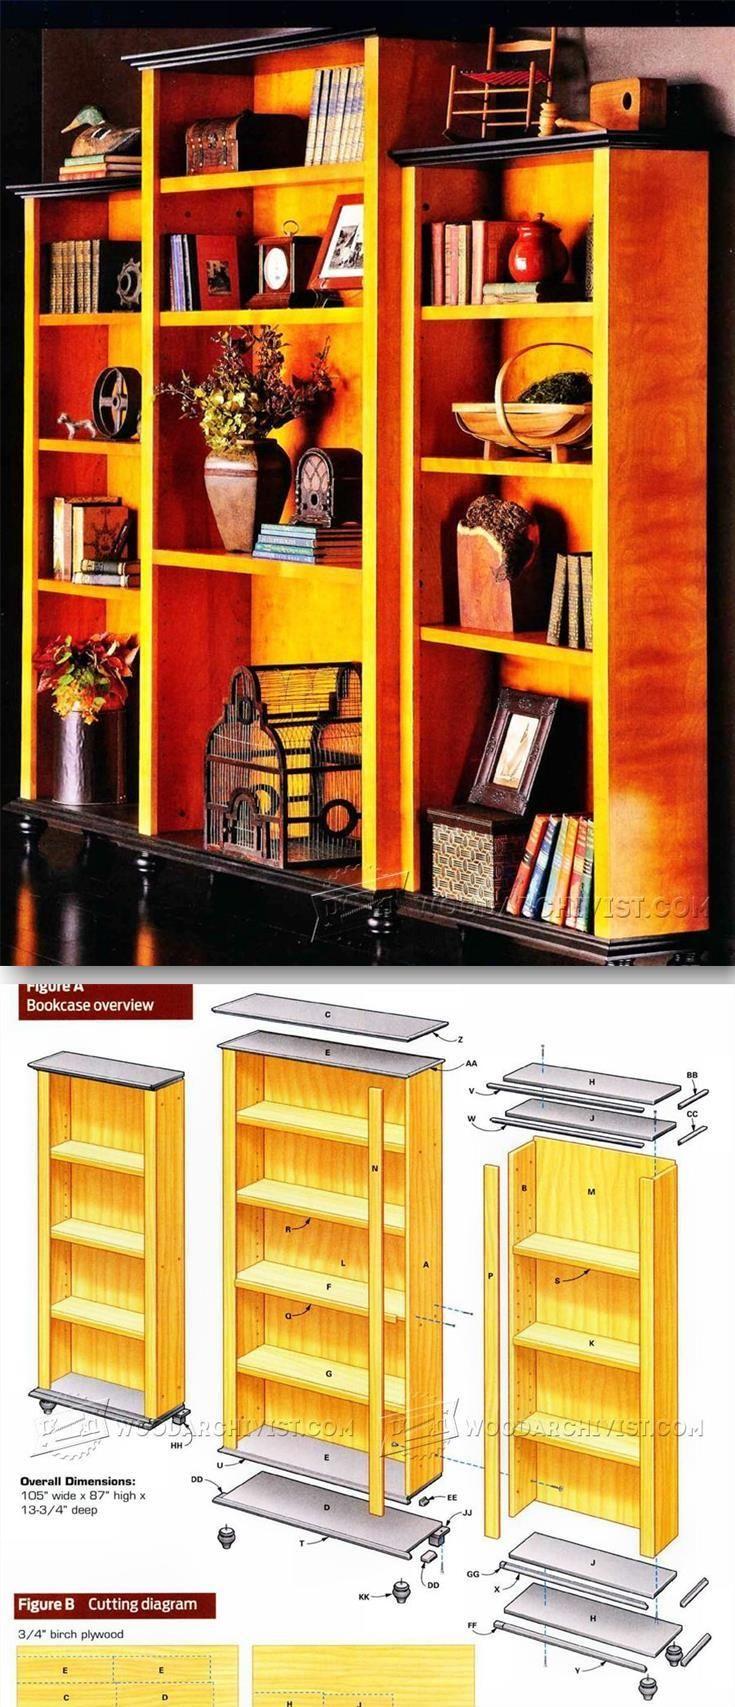 186 best shelves & brackets images on Pinterest | Woodworking plans ...